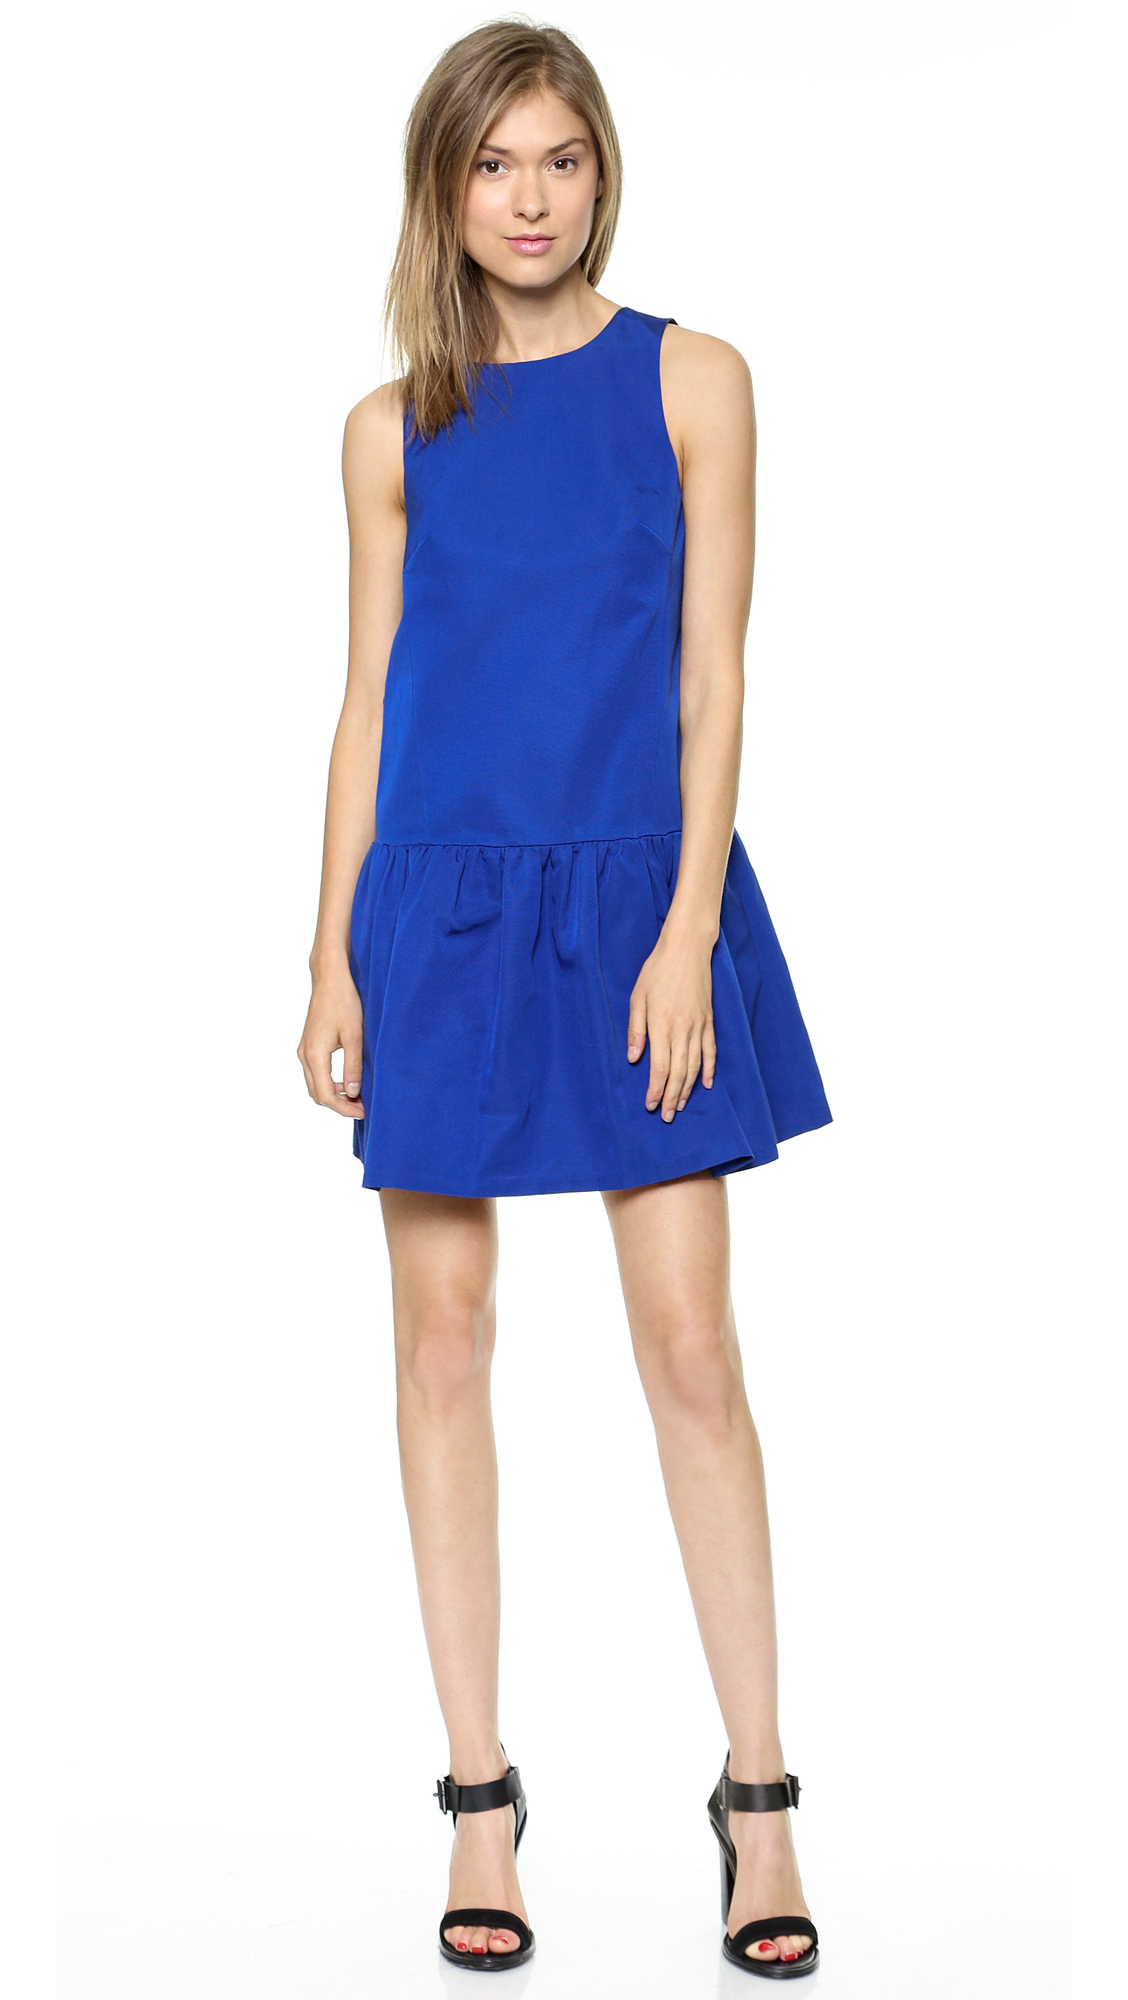 Tibi Sleeveless Flirty Dress Electric Blue in Blue - Lyst